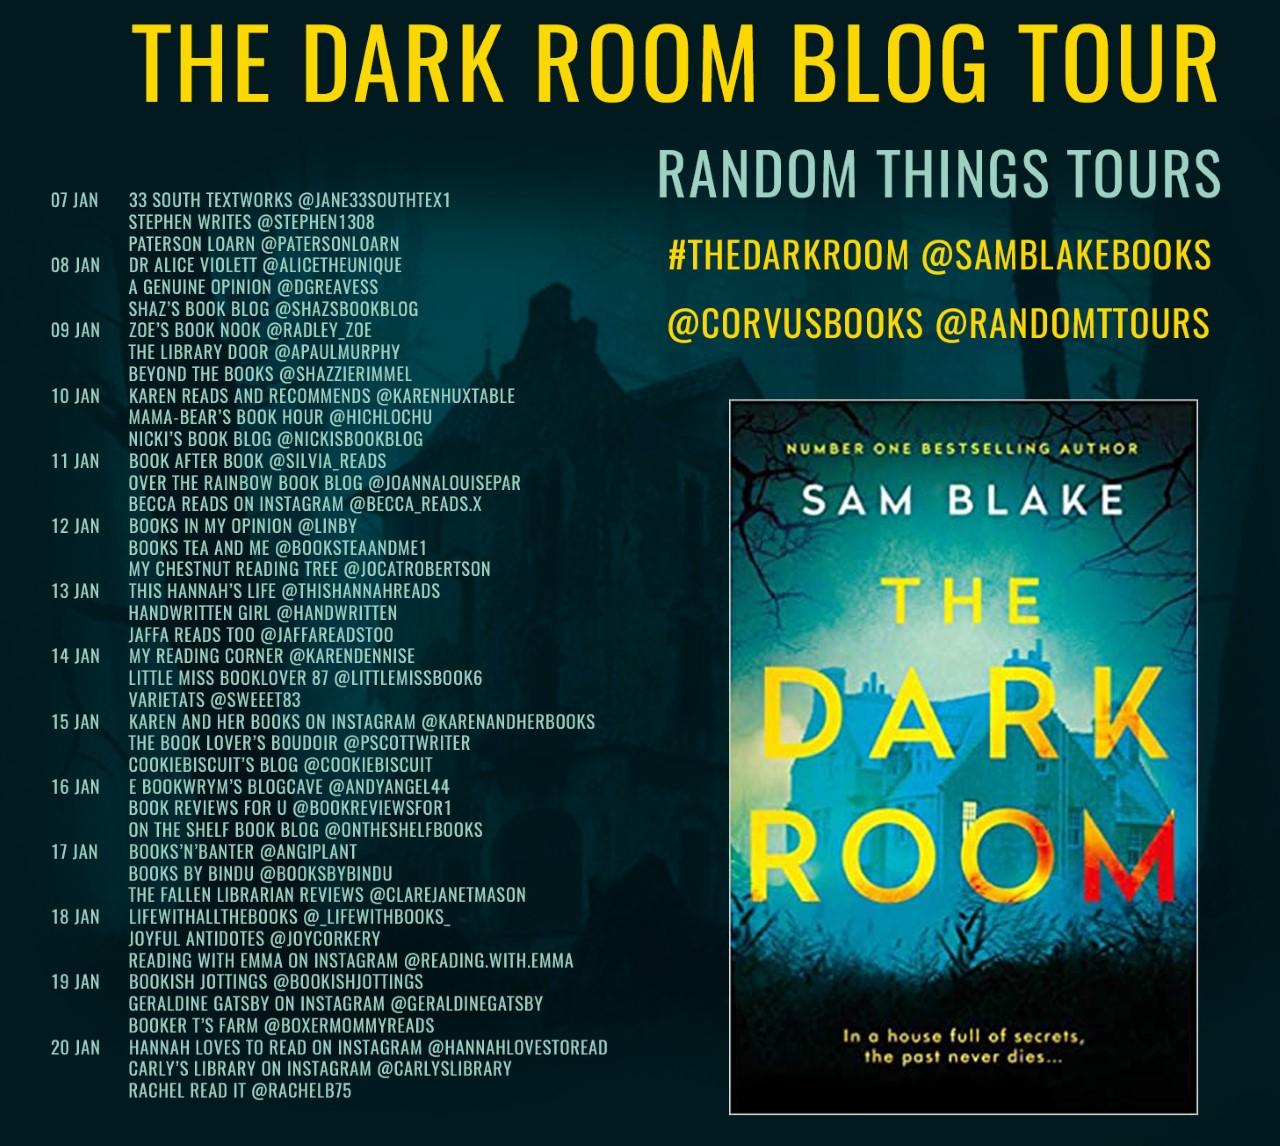 The Dark Room Blog Tour